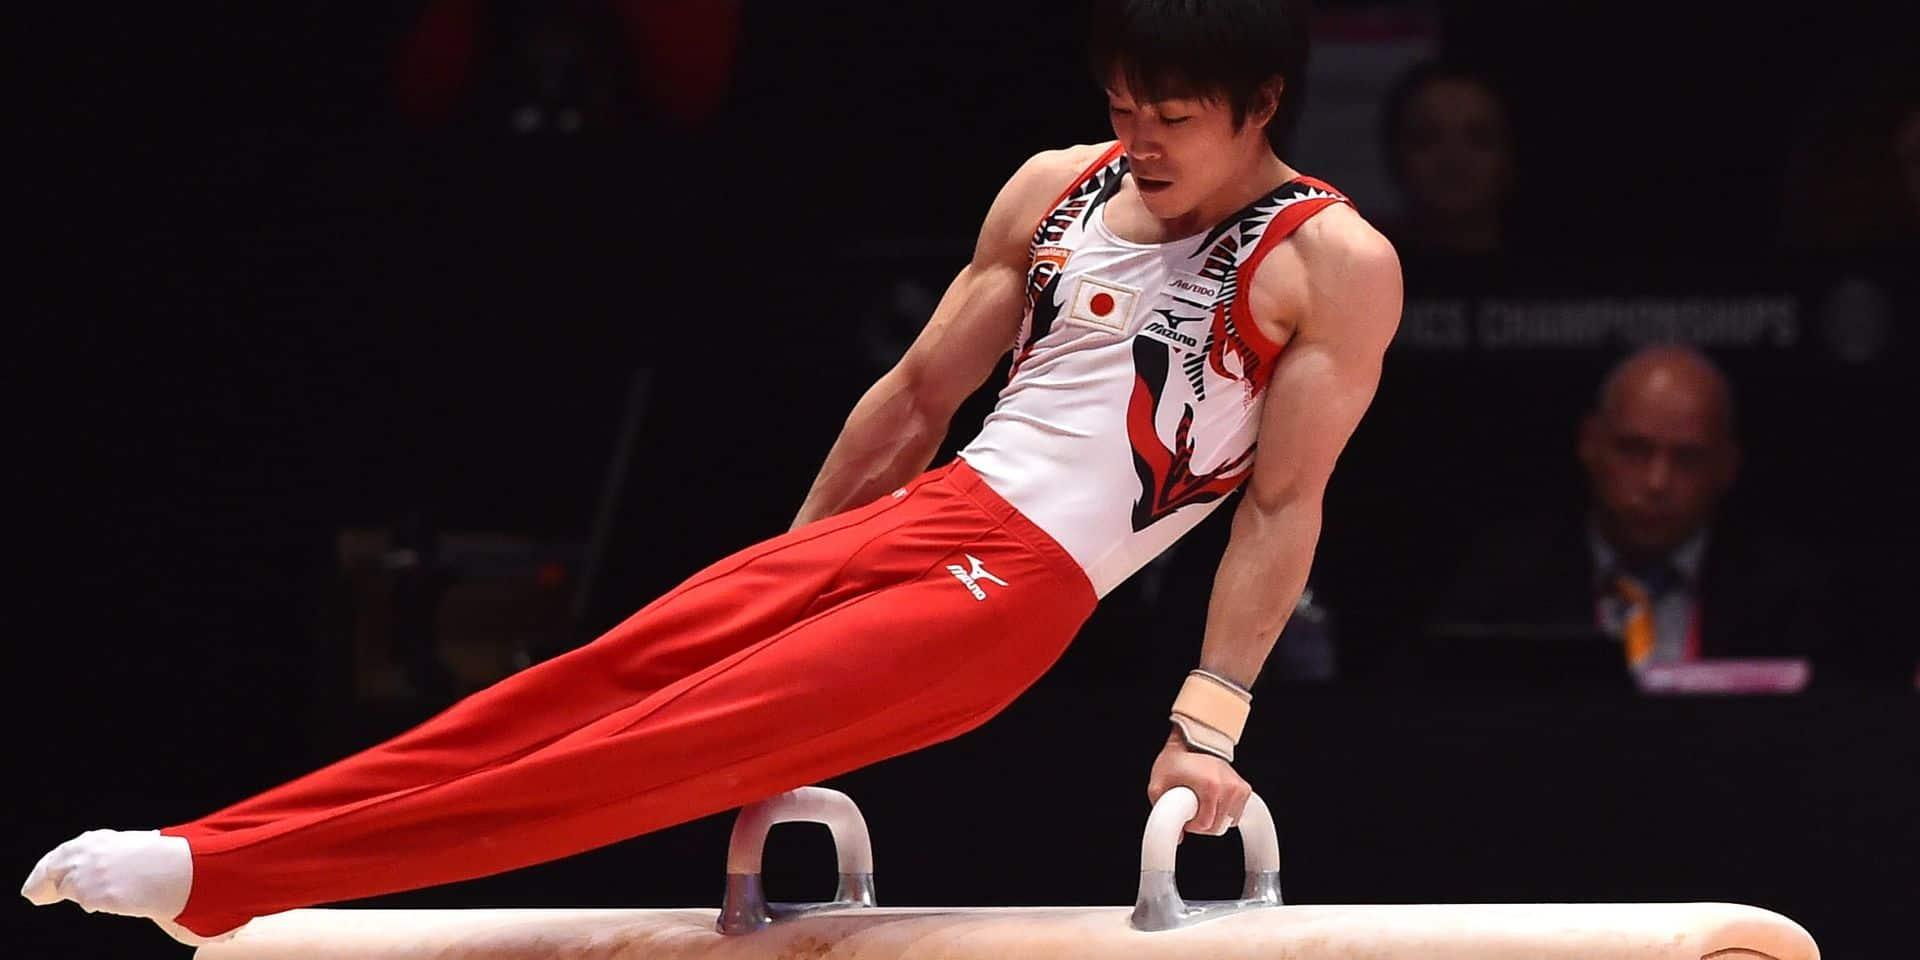 Le gymnaste japonais Uchimura positif au coronavirus